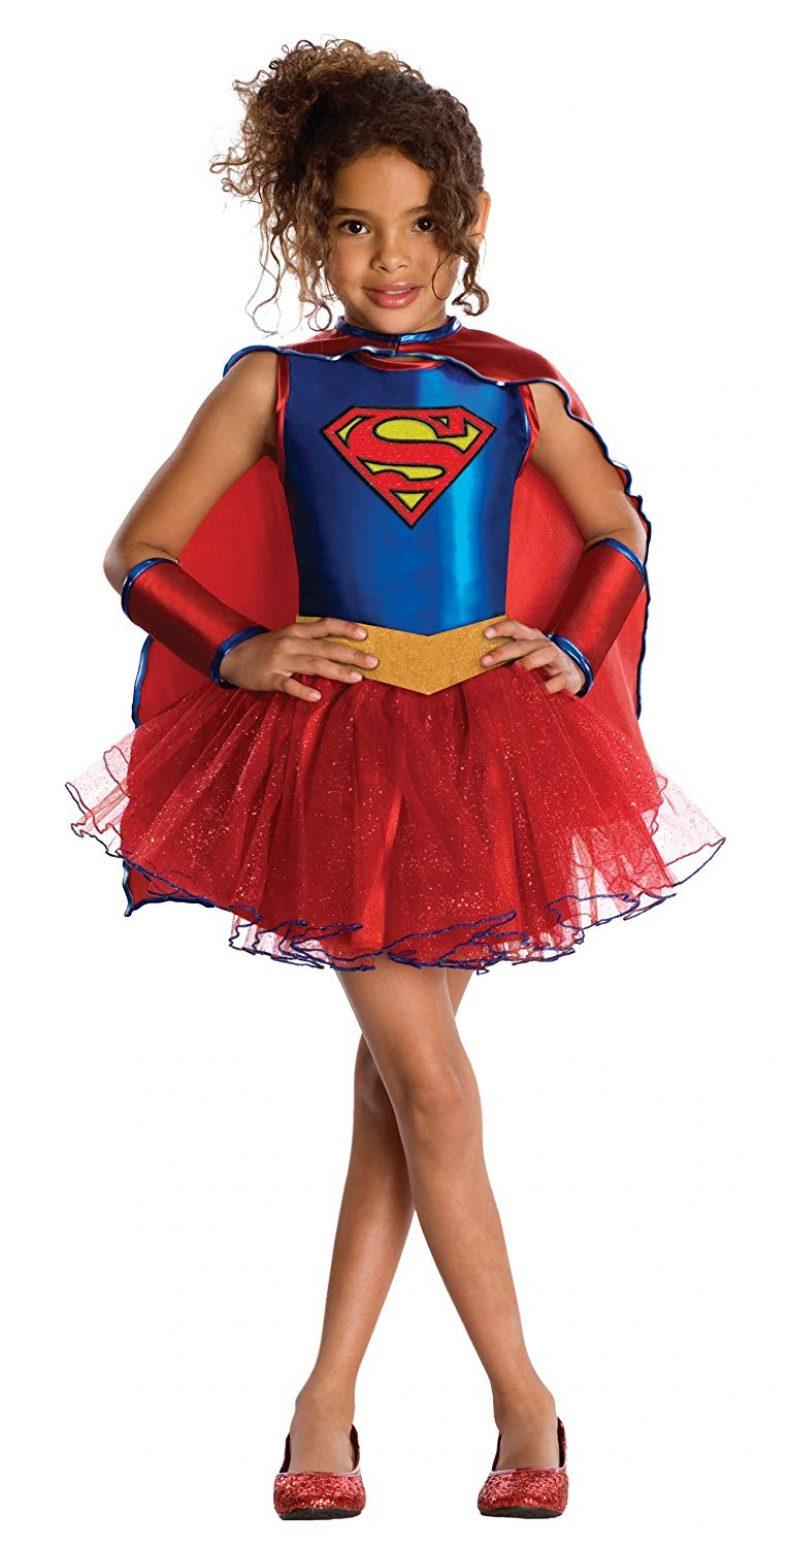 Rubies DC Superheroes Tutu Skirt